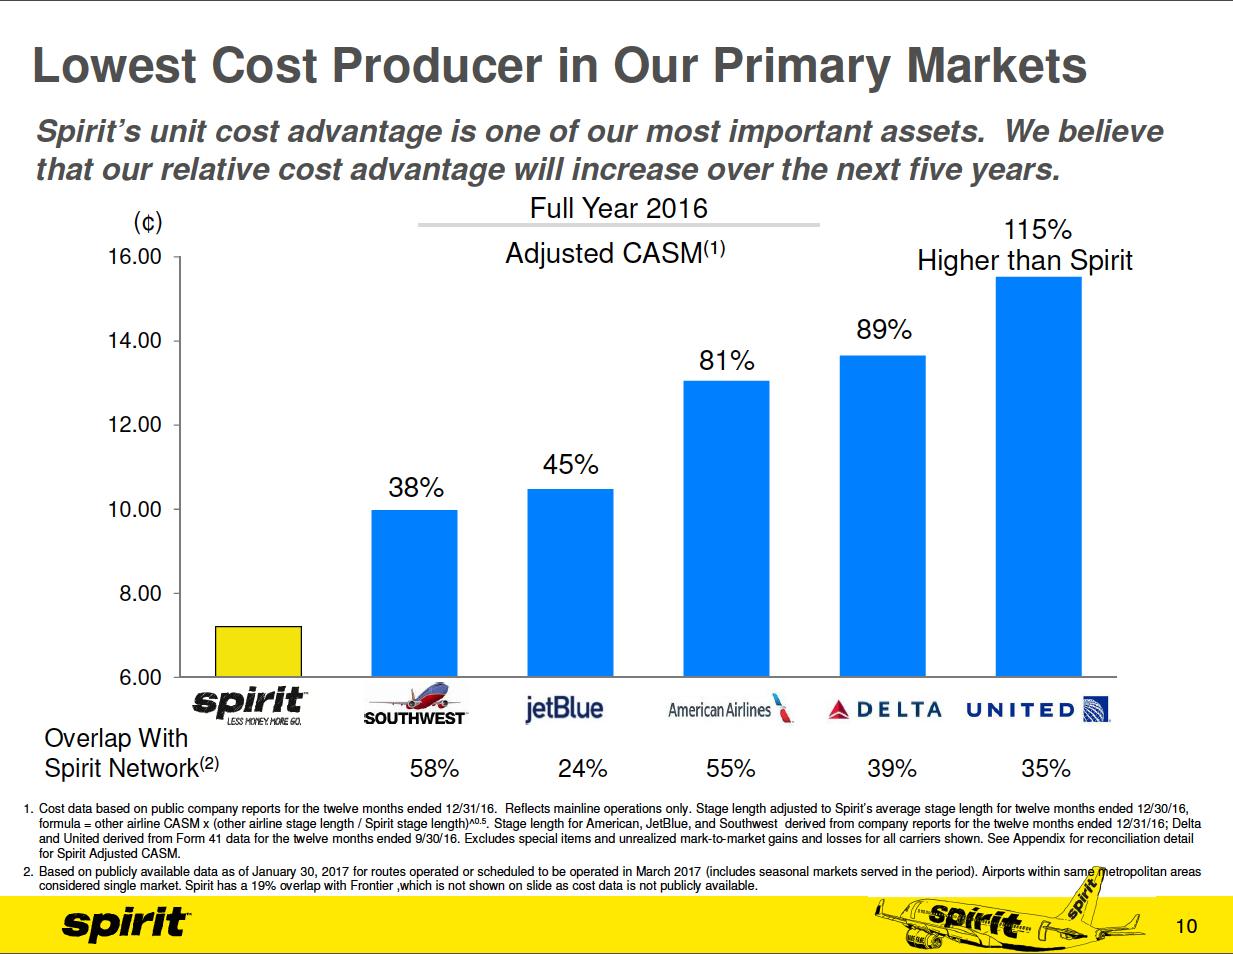 Chart showing Spirit's unit cost advantage over its competitors